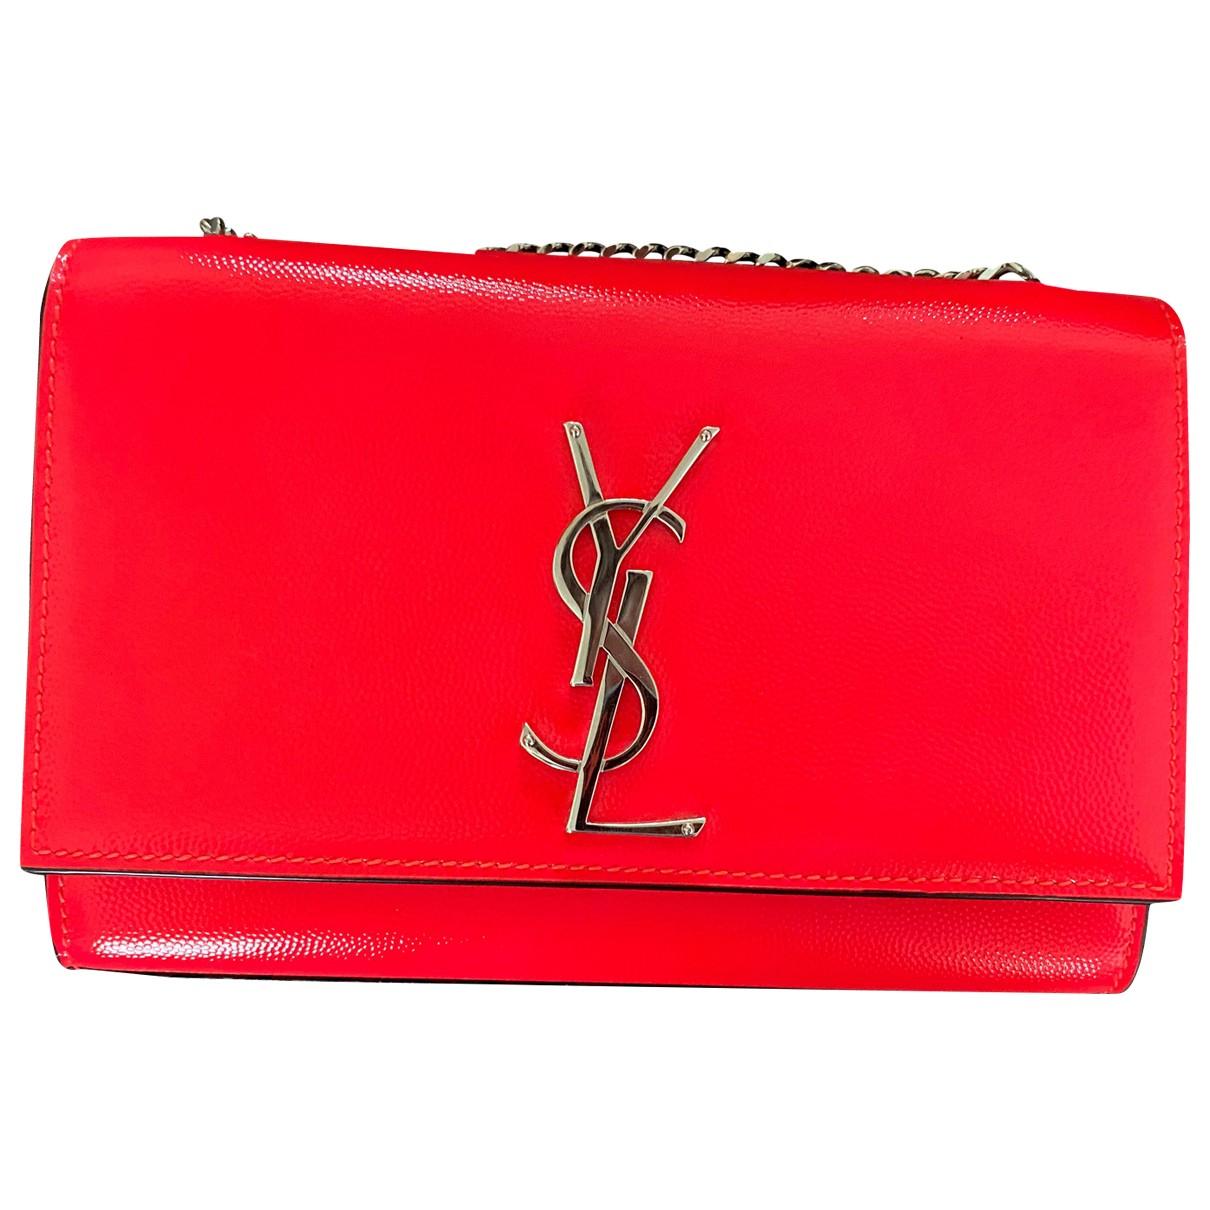 Saint Laurent Kate monogramme Handtasche in Leder